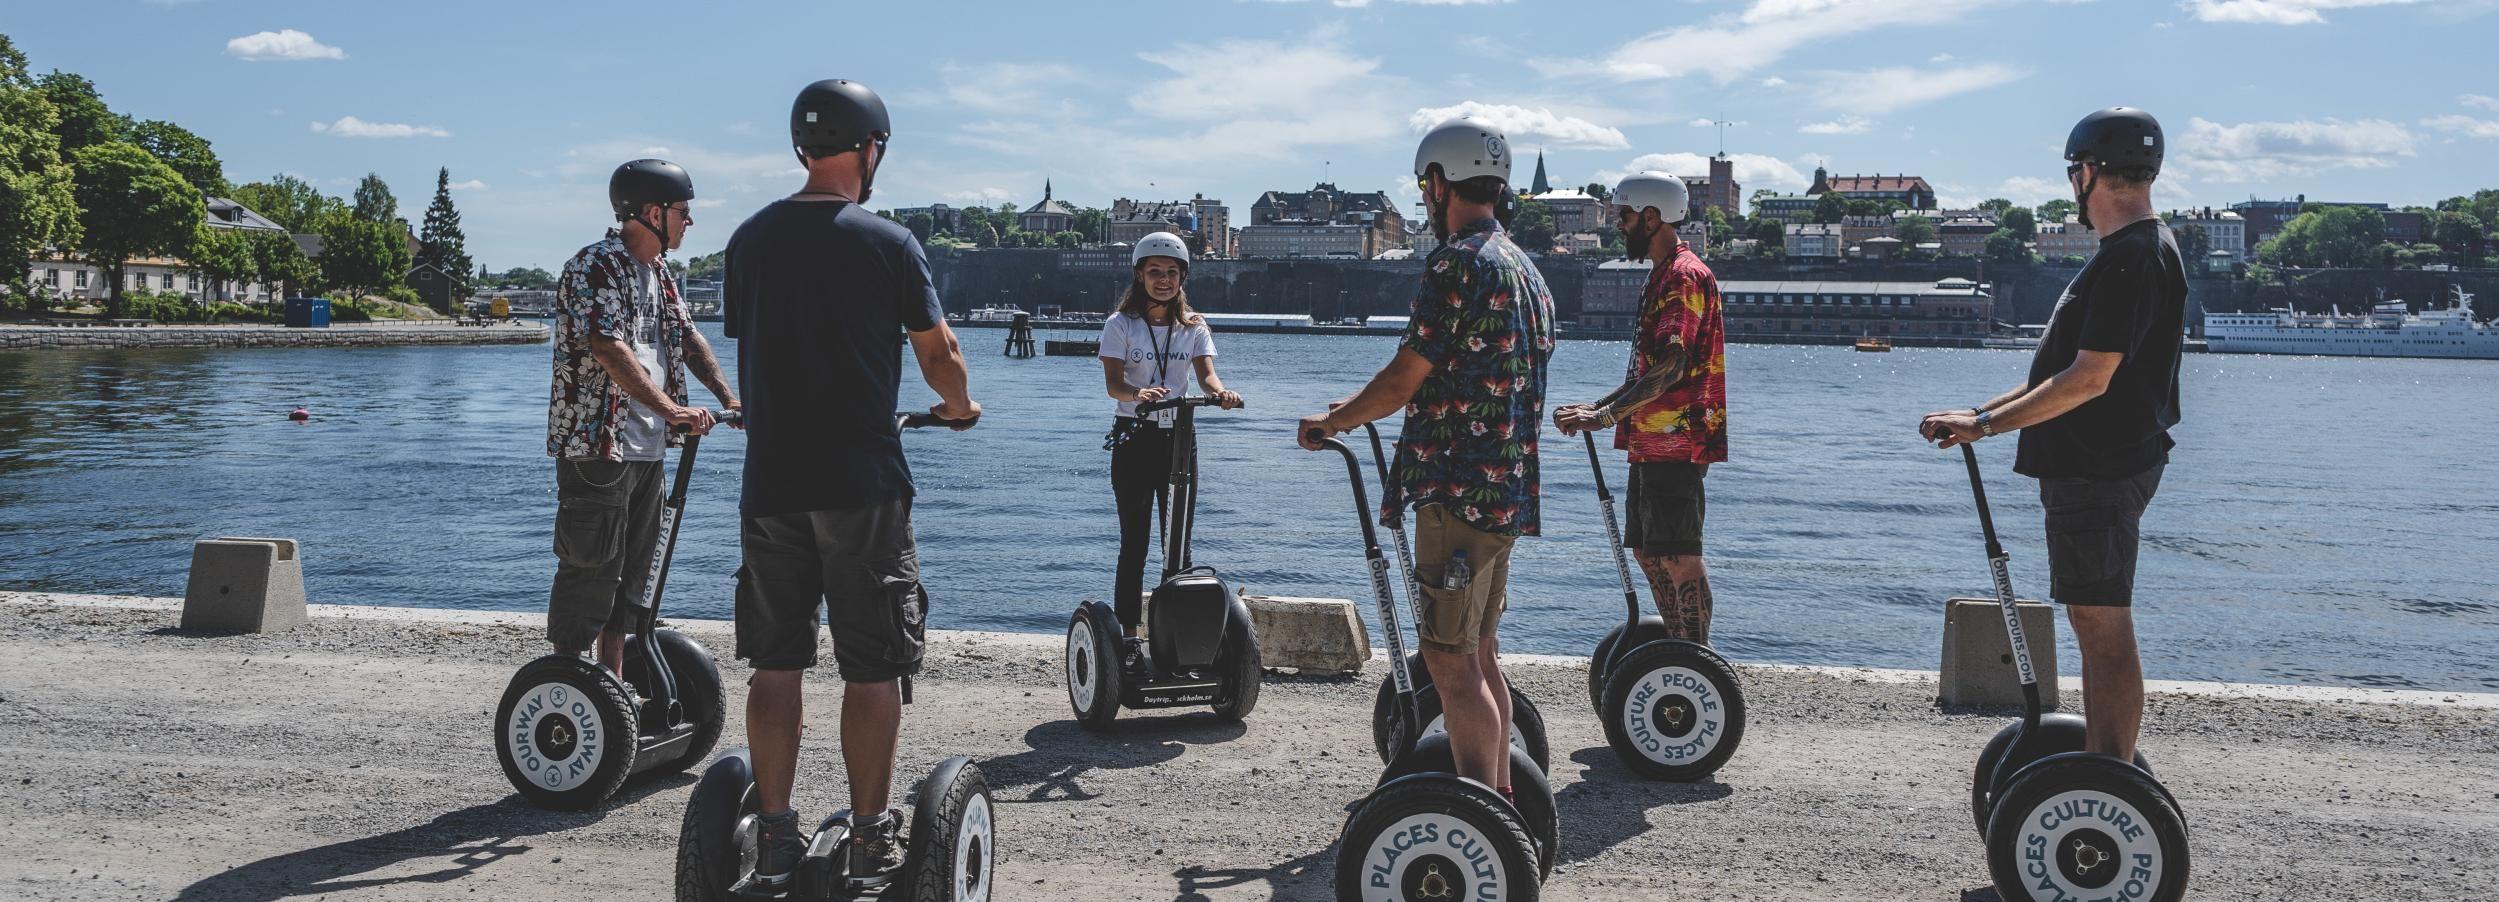 Meraviglie di Stoccolma: tour in Segway di 2 ore